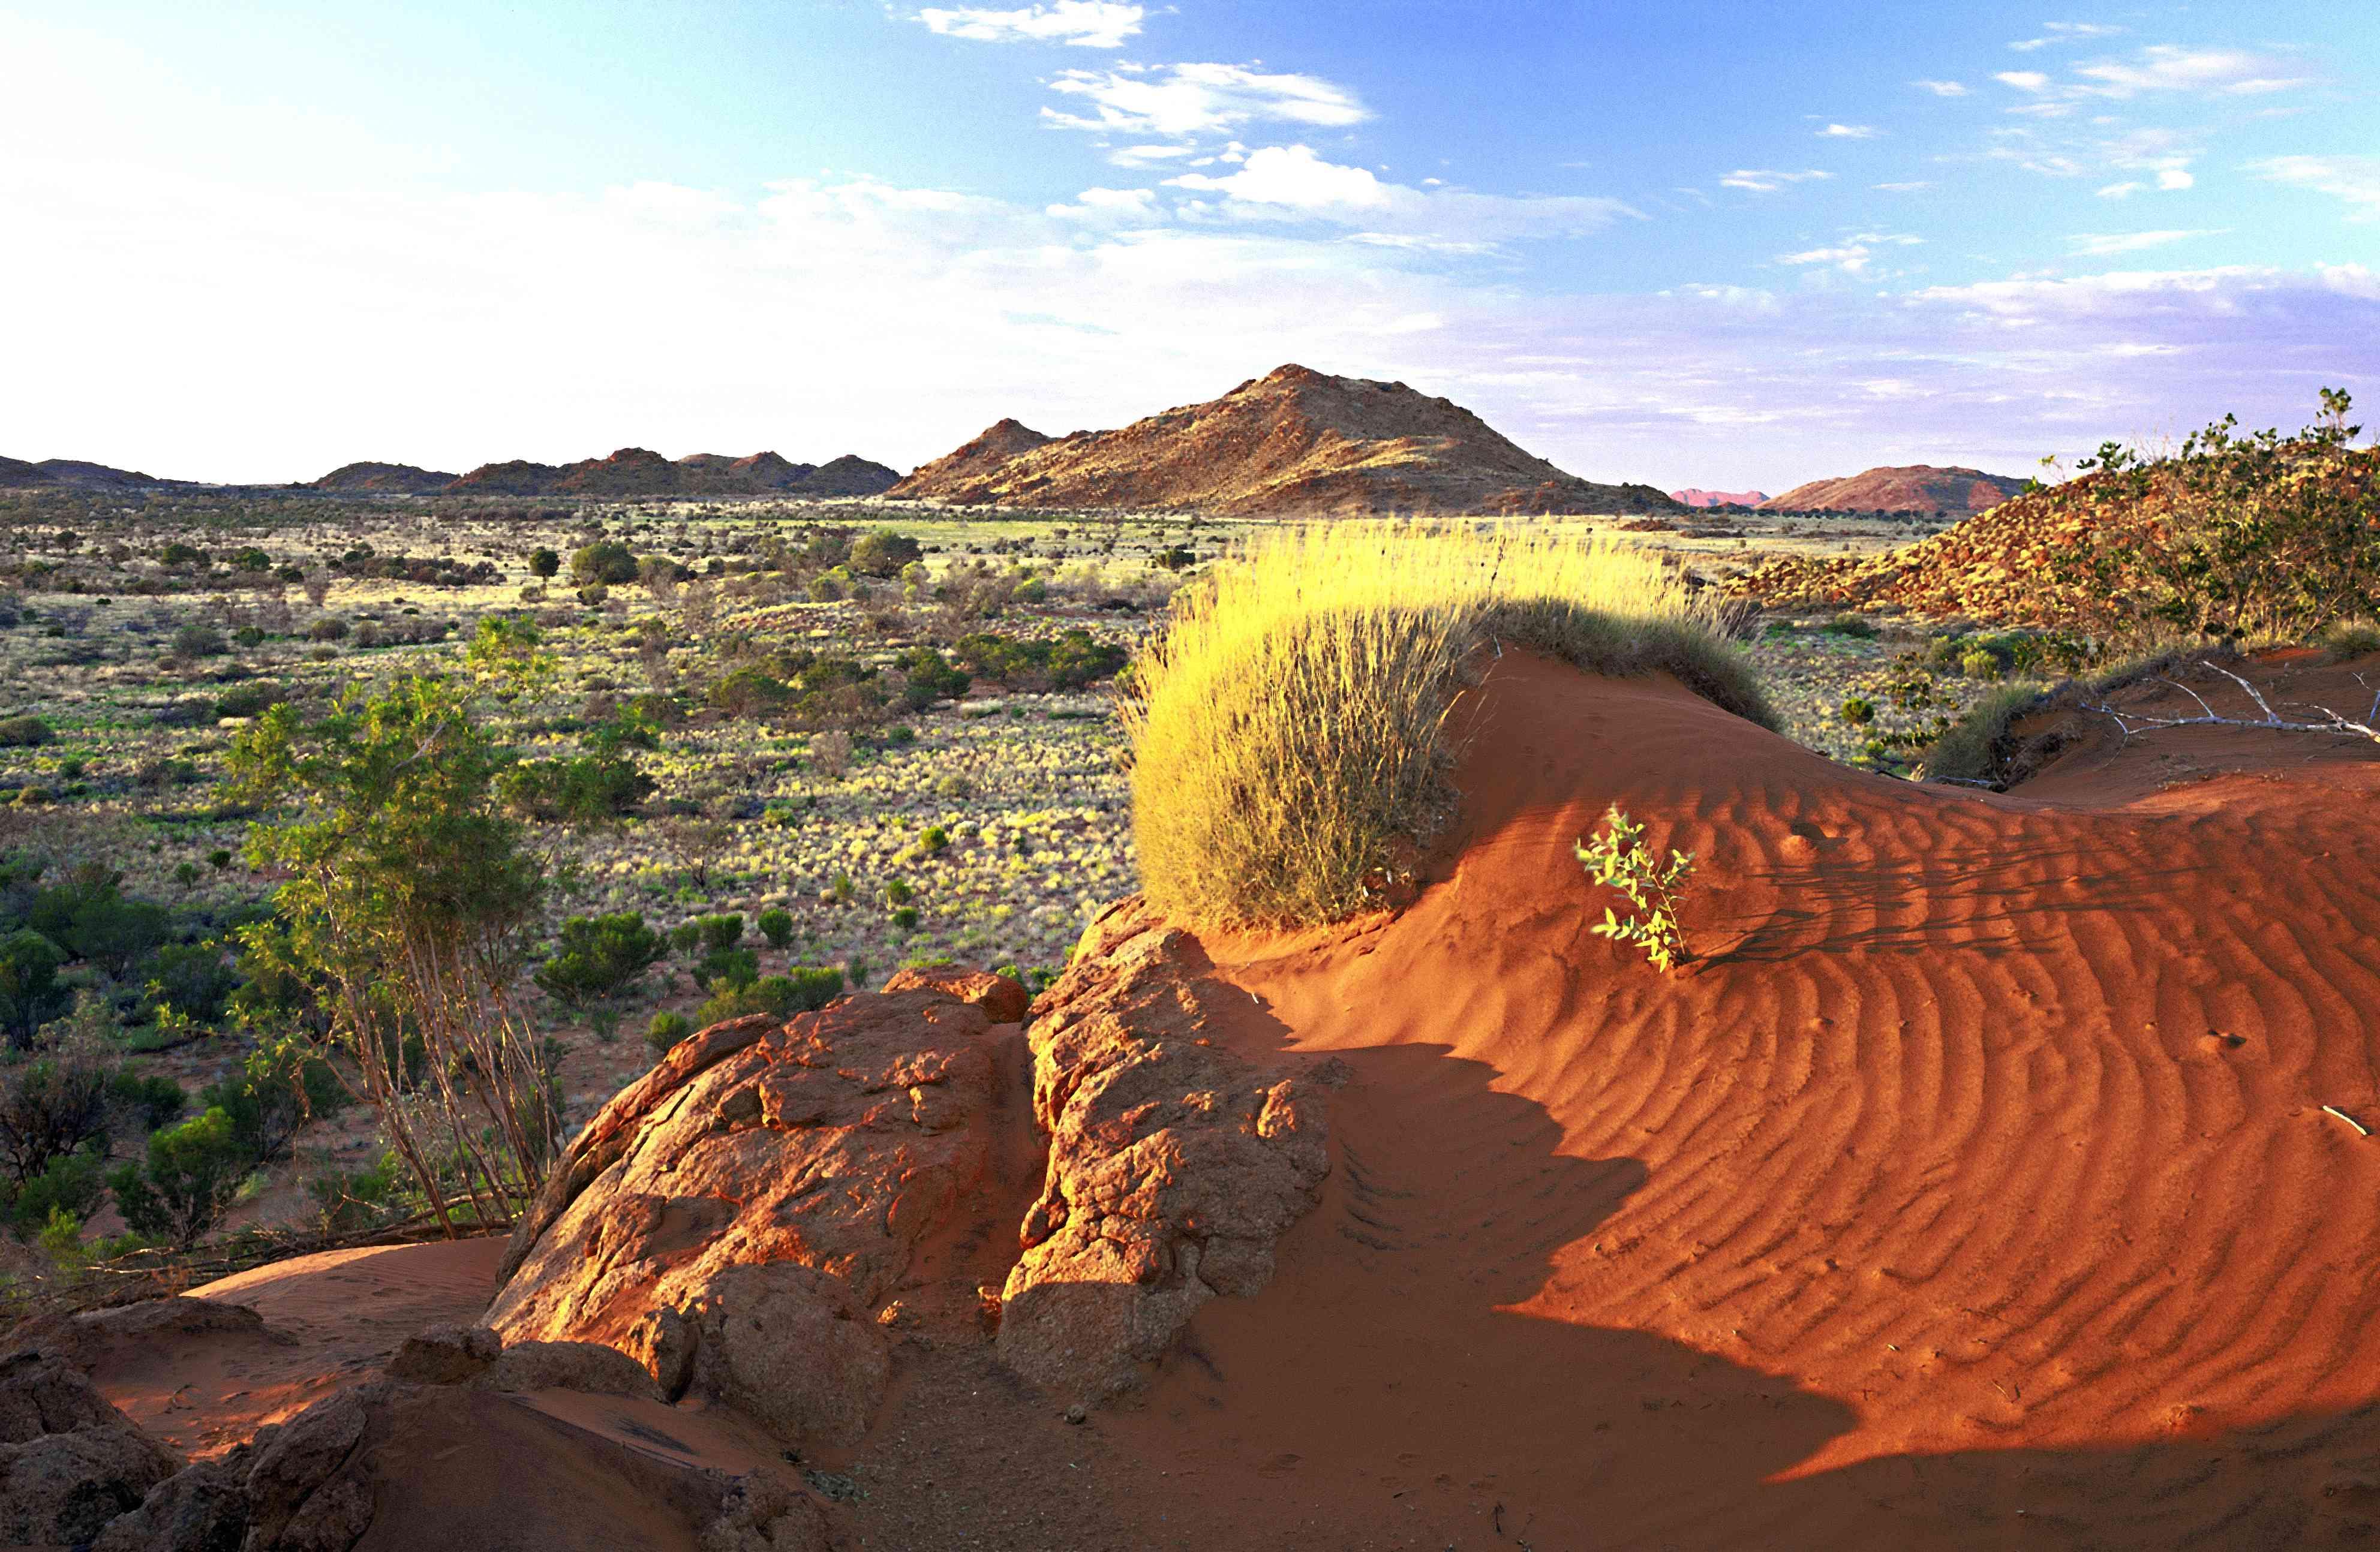 Landscape of the Great Victoria Desert in Australia